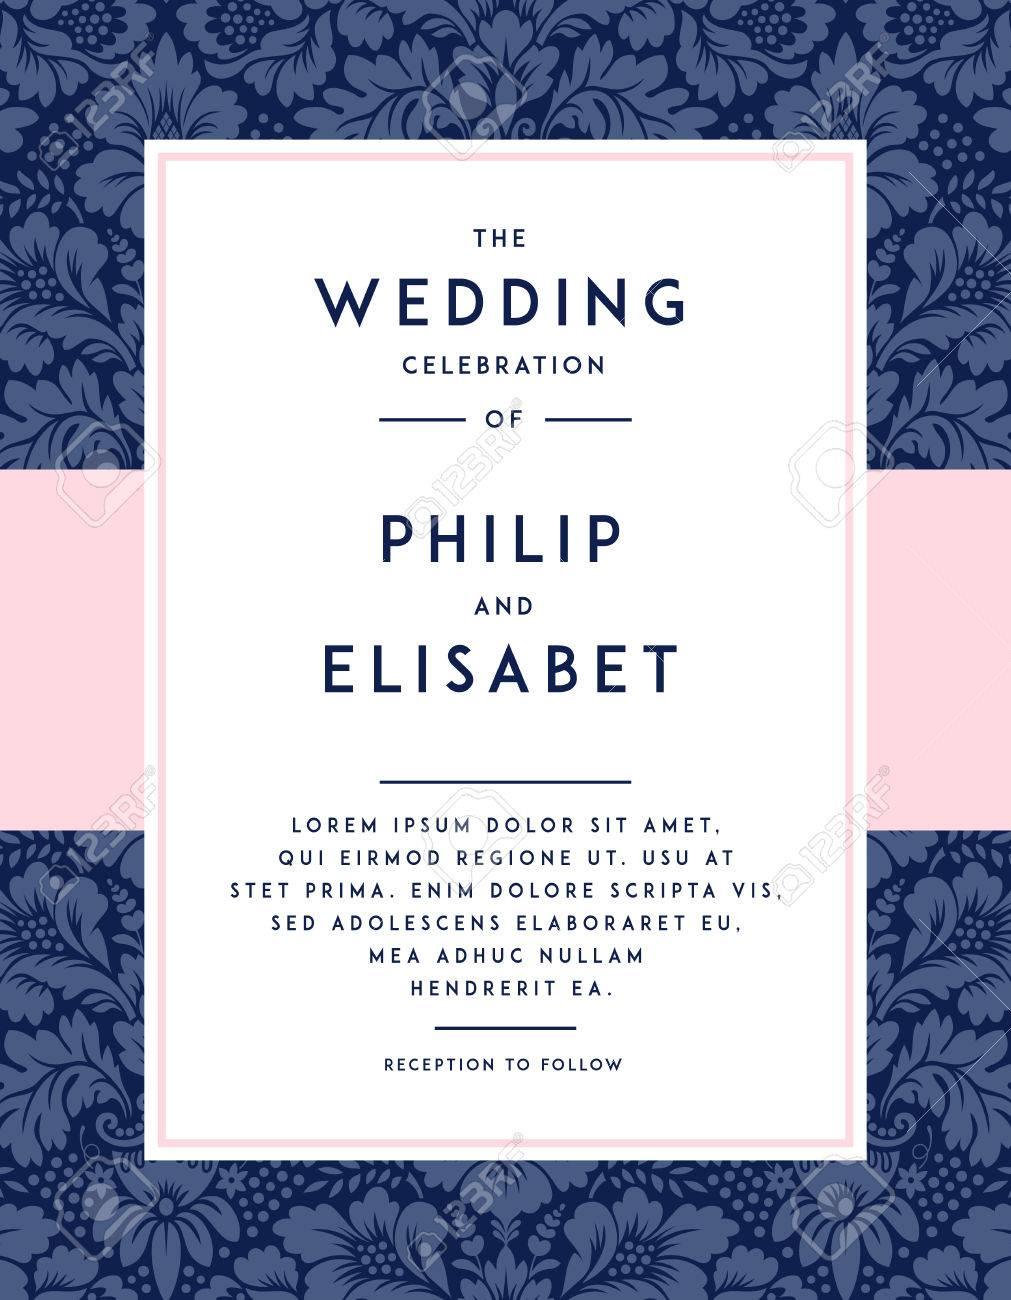 Vintage Wedding Invitation Template. Vintage Design. Wedding ...